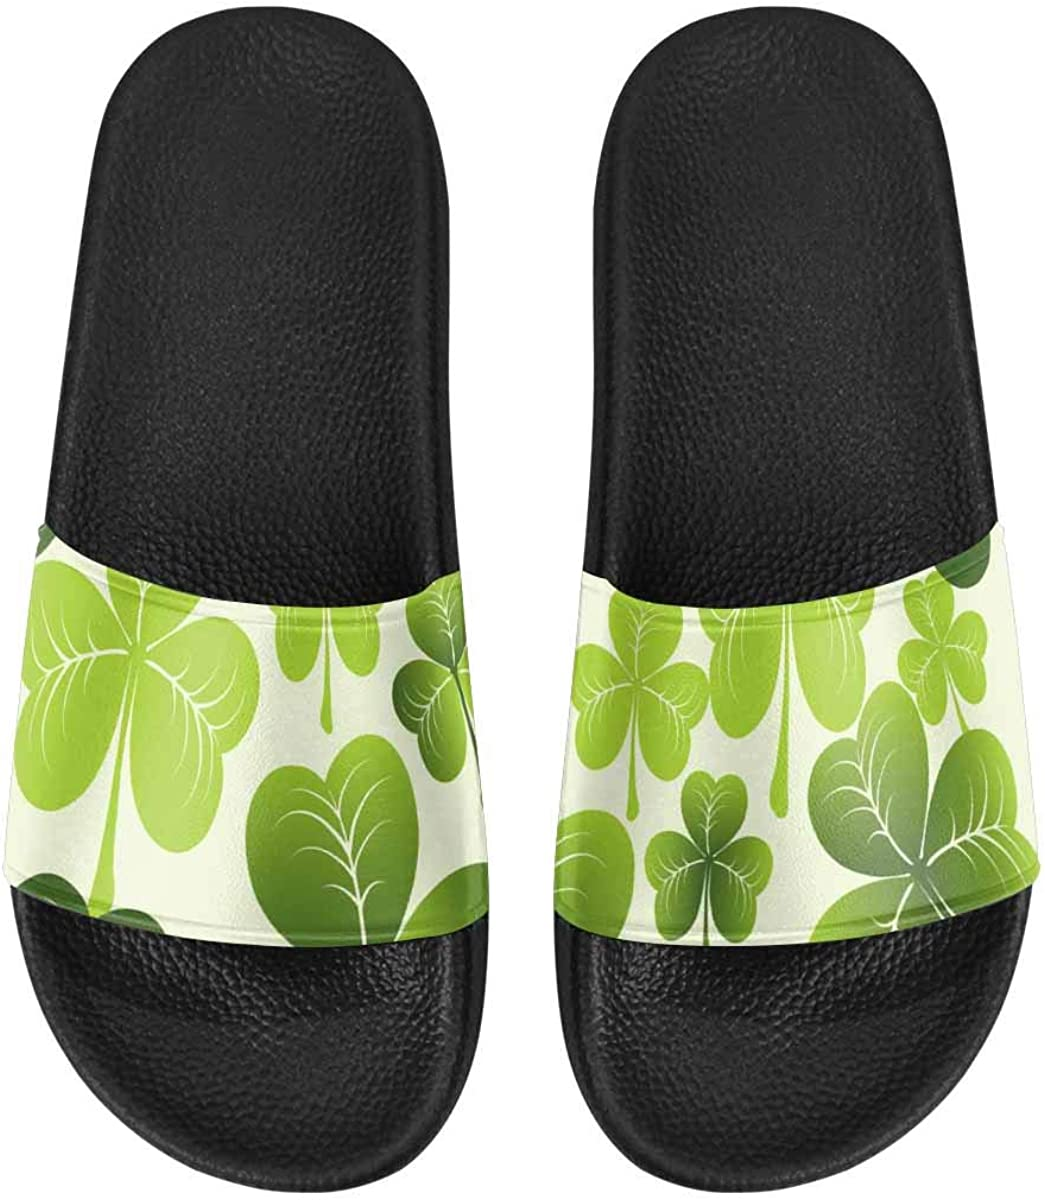 InterestPrint Women's Lightweight Slipper Sandals for Shower Happy St. Patrick's